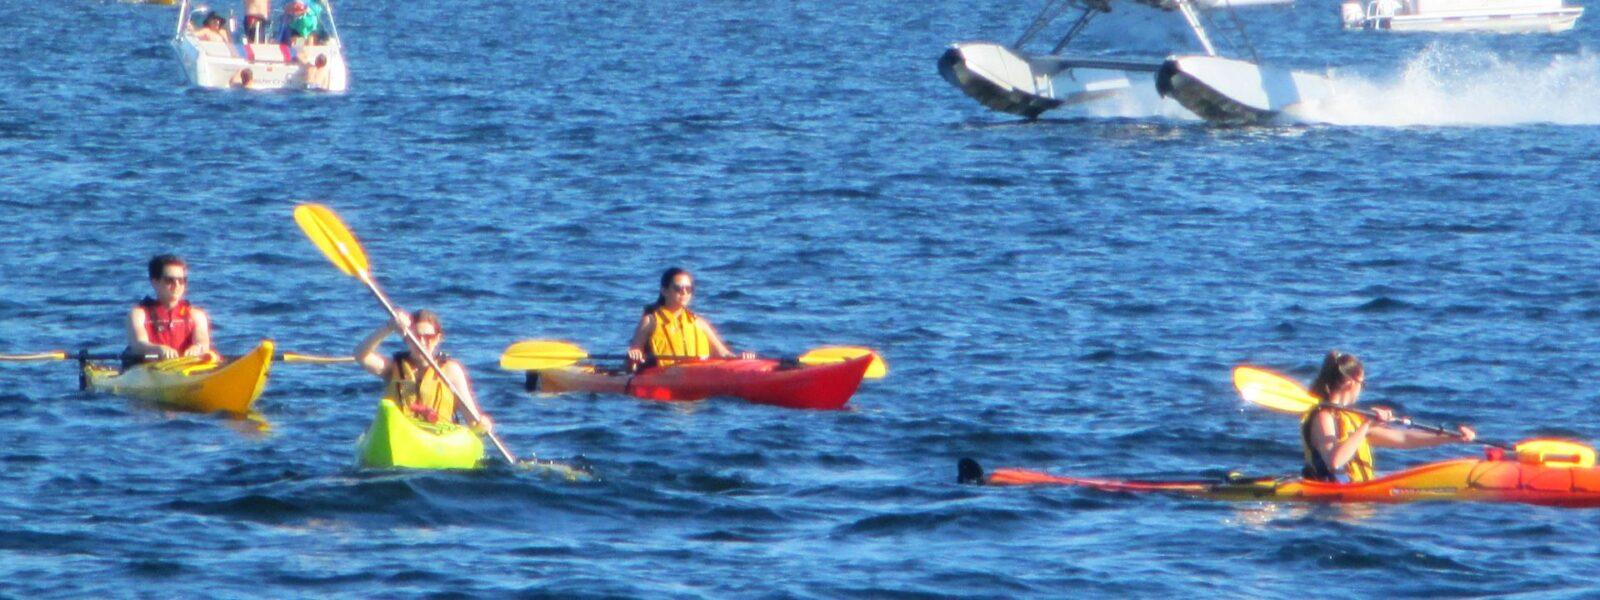 Seattle Easter Boat Parade, Superyachts NW, PNW, Puget Sound, Bellingham, Go Boating, Salty Dog Boating